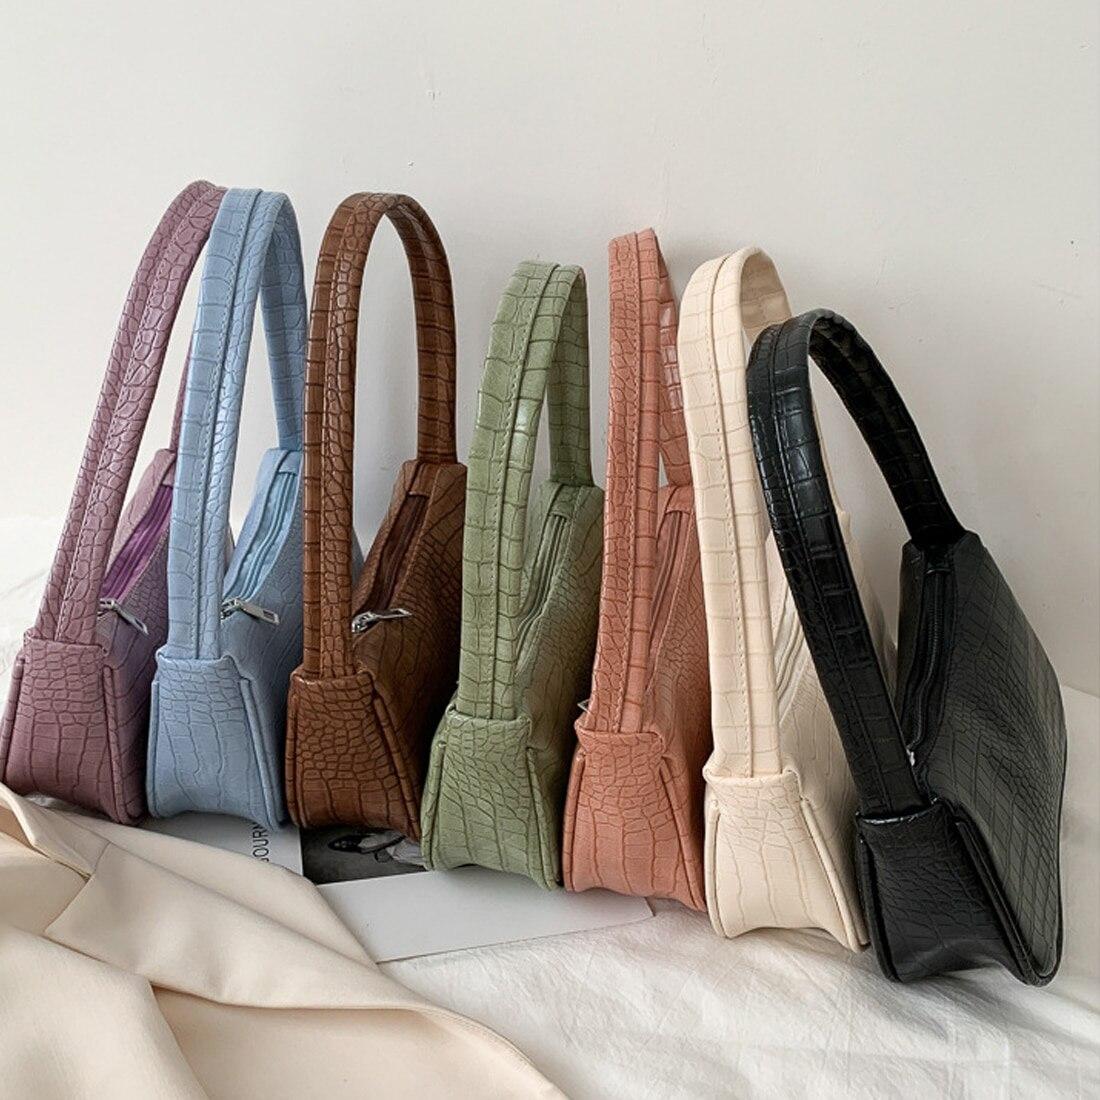 PUIMENTIUA Retro Alligator Pattern Women Messenger Handbags sac PU Leather Street Casual Solid Zipper Shoulder Bags Bolsa Mujer